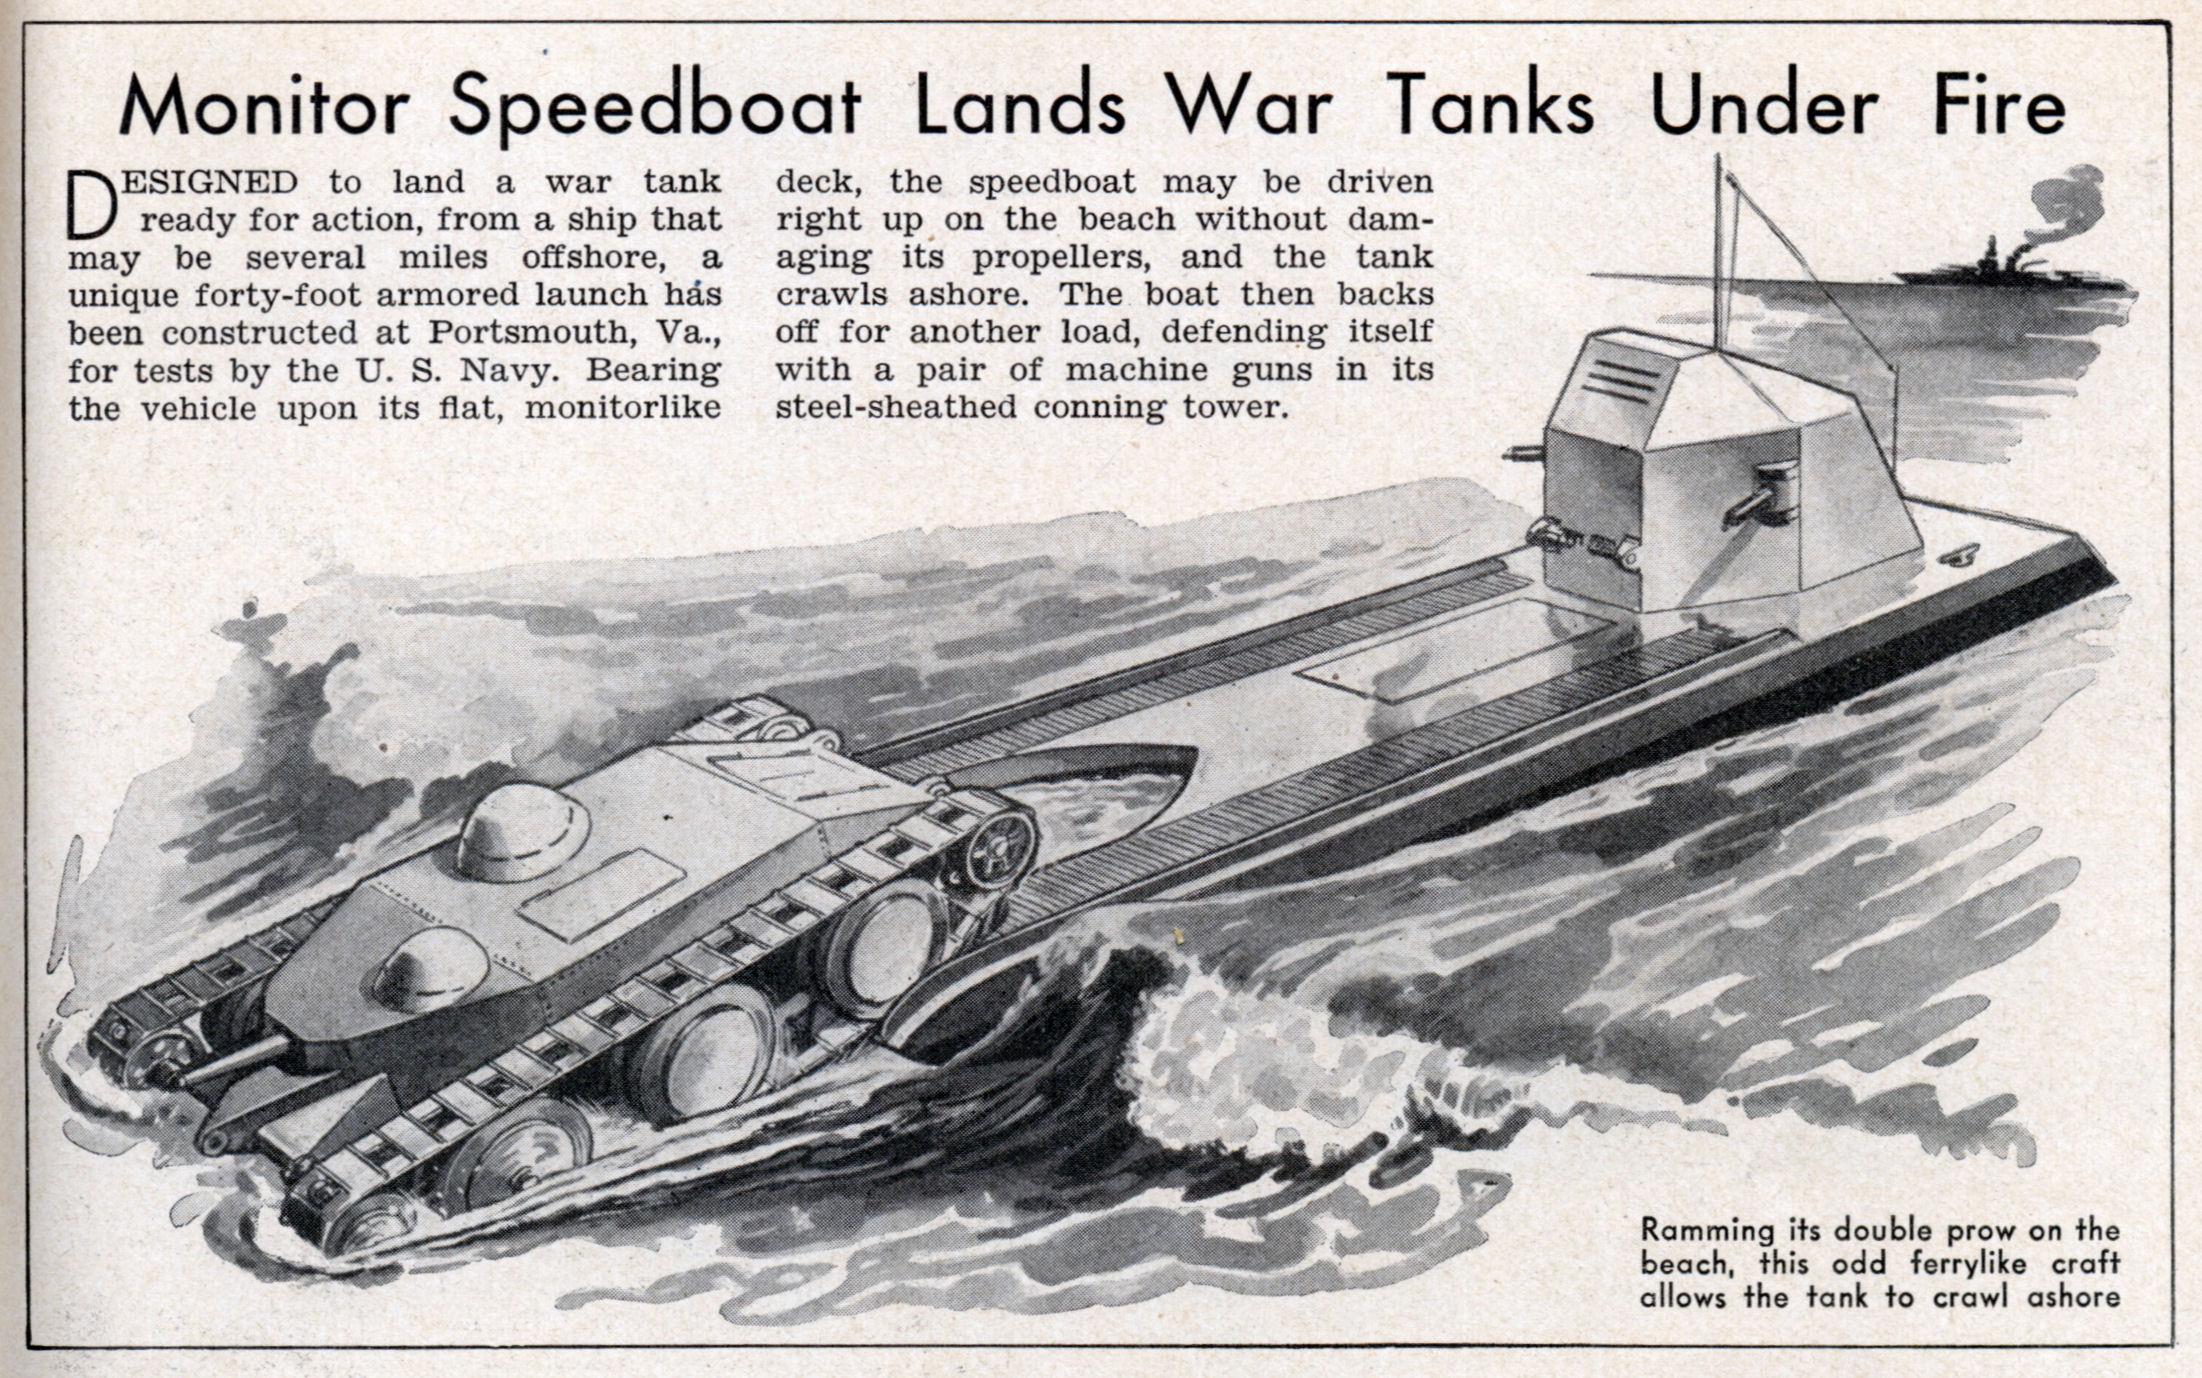 Speedboat lands war tanks under fire designed to land a war tank